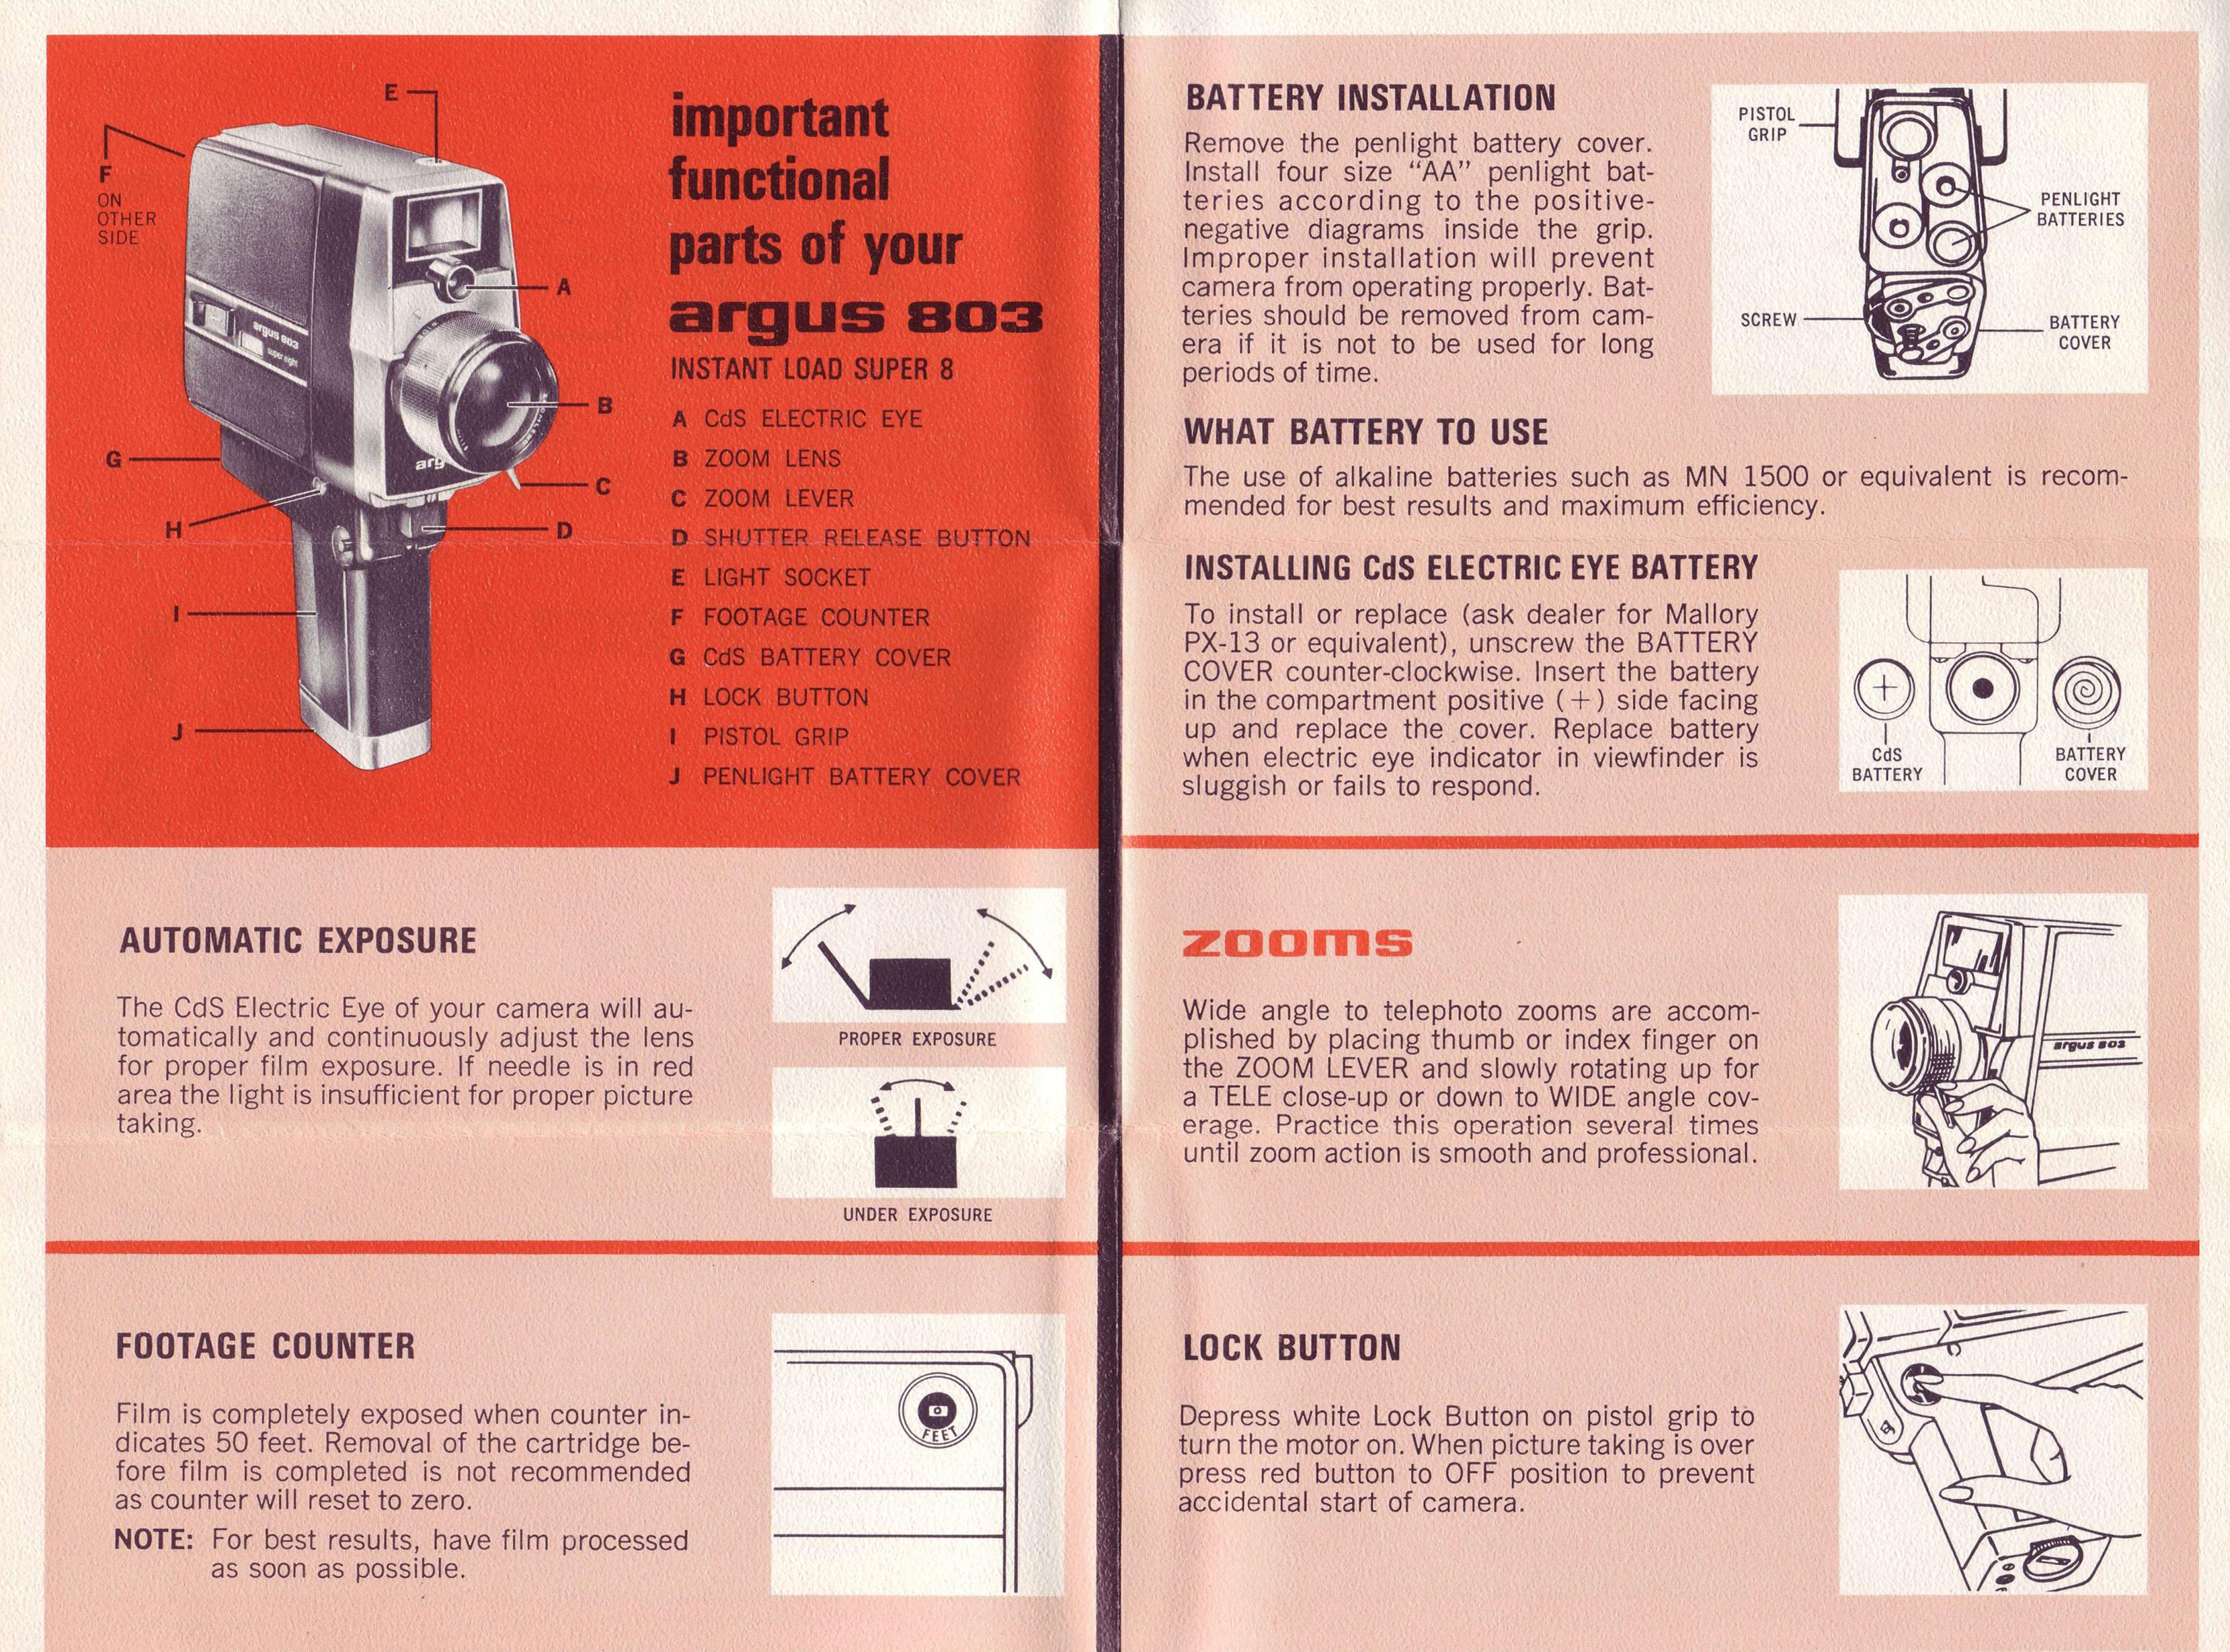 argus 803 zoom movie camera instruction manual ann arbor district rh aadl org camera instruction manual e-m10 mark ii camera instruction manual e-m10 mark ii